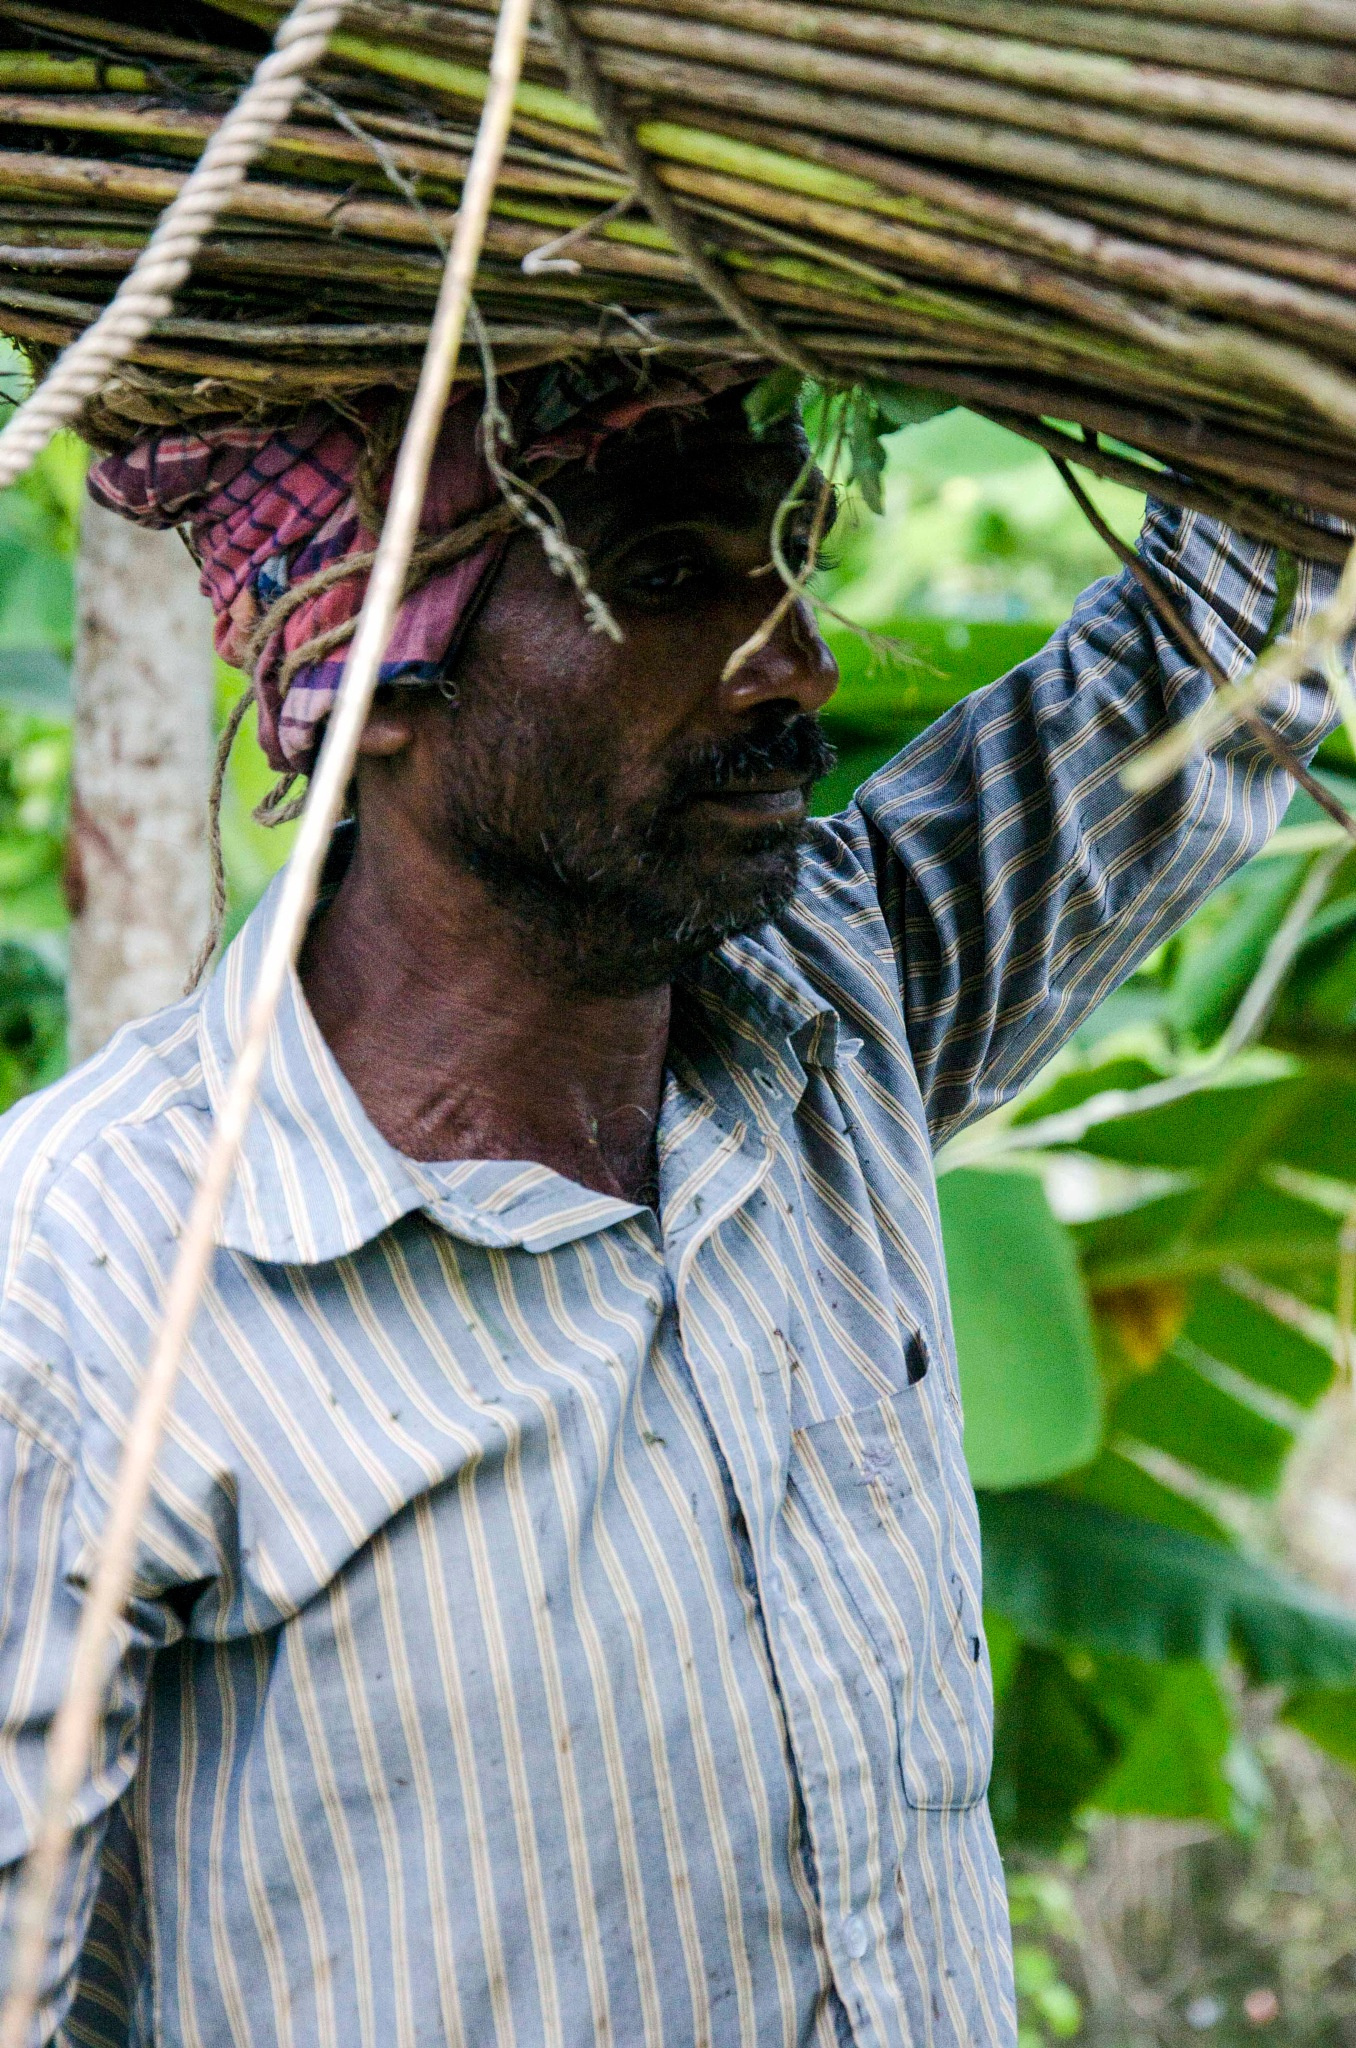 Life around us (Working People) by Shafiqul Islam Shiplu Photography